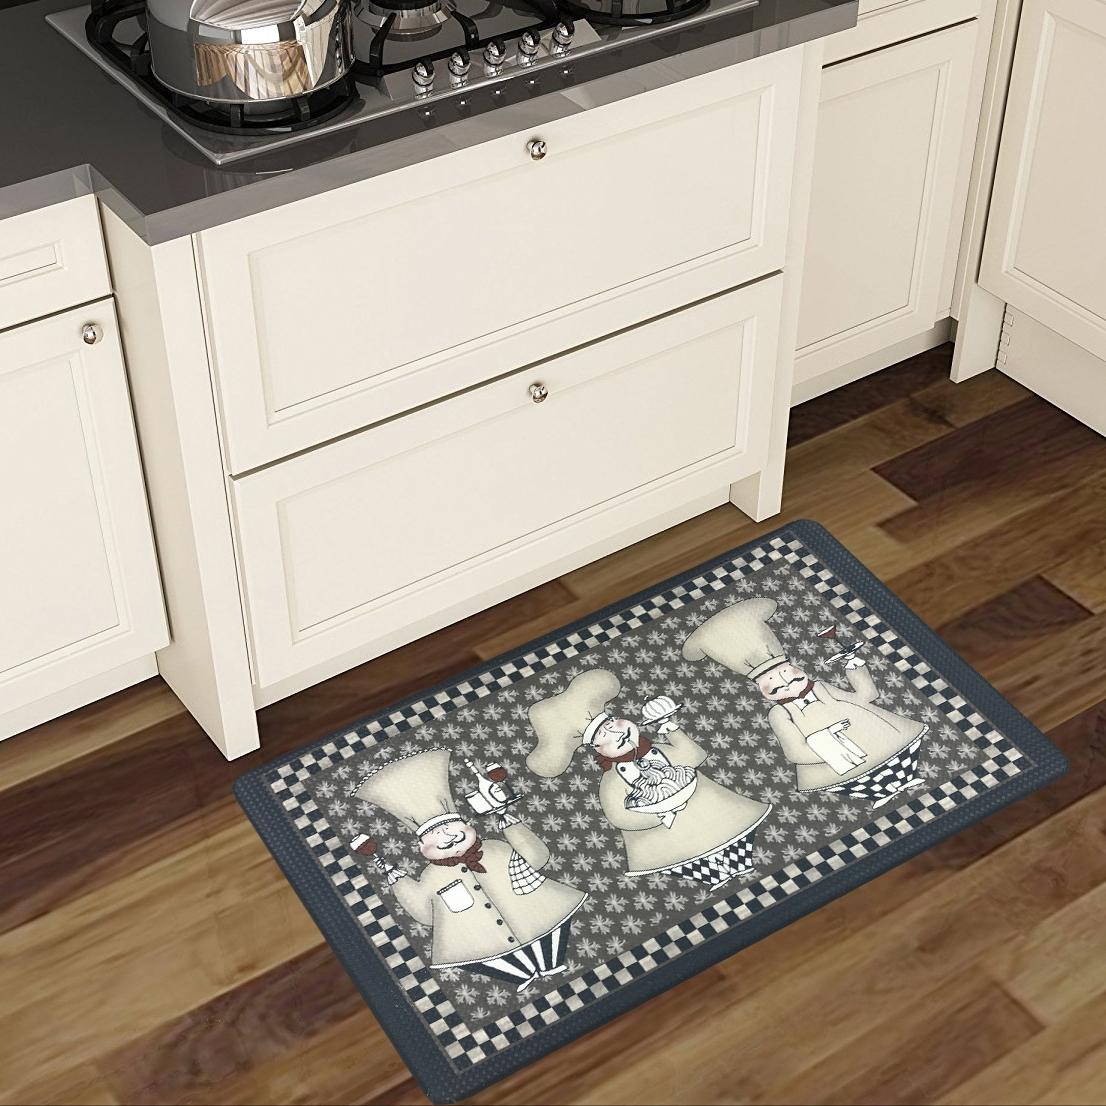 Decorative Kitchen Mats Anti Fatigue Comfort Floor Mat